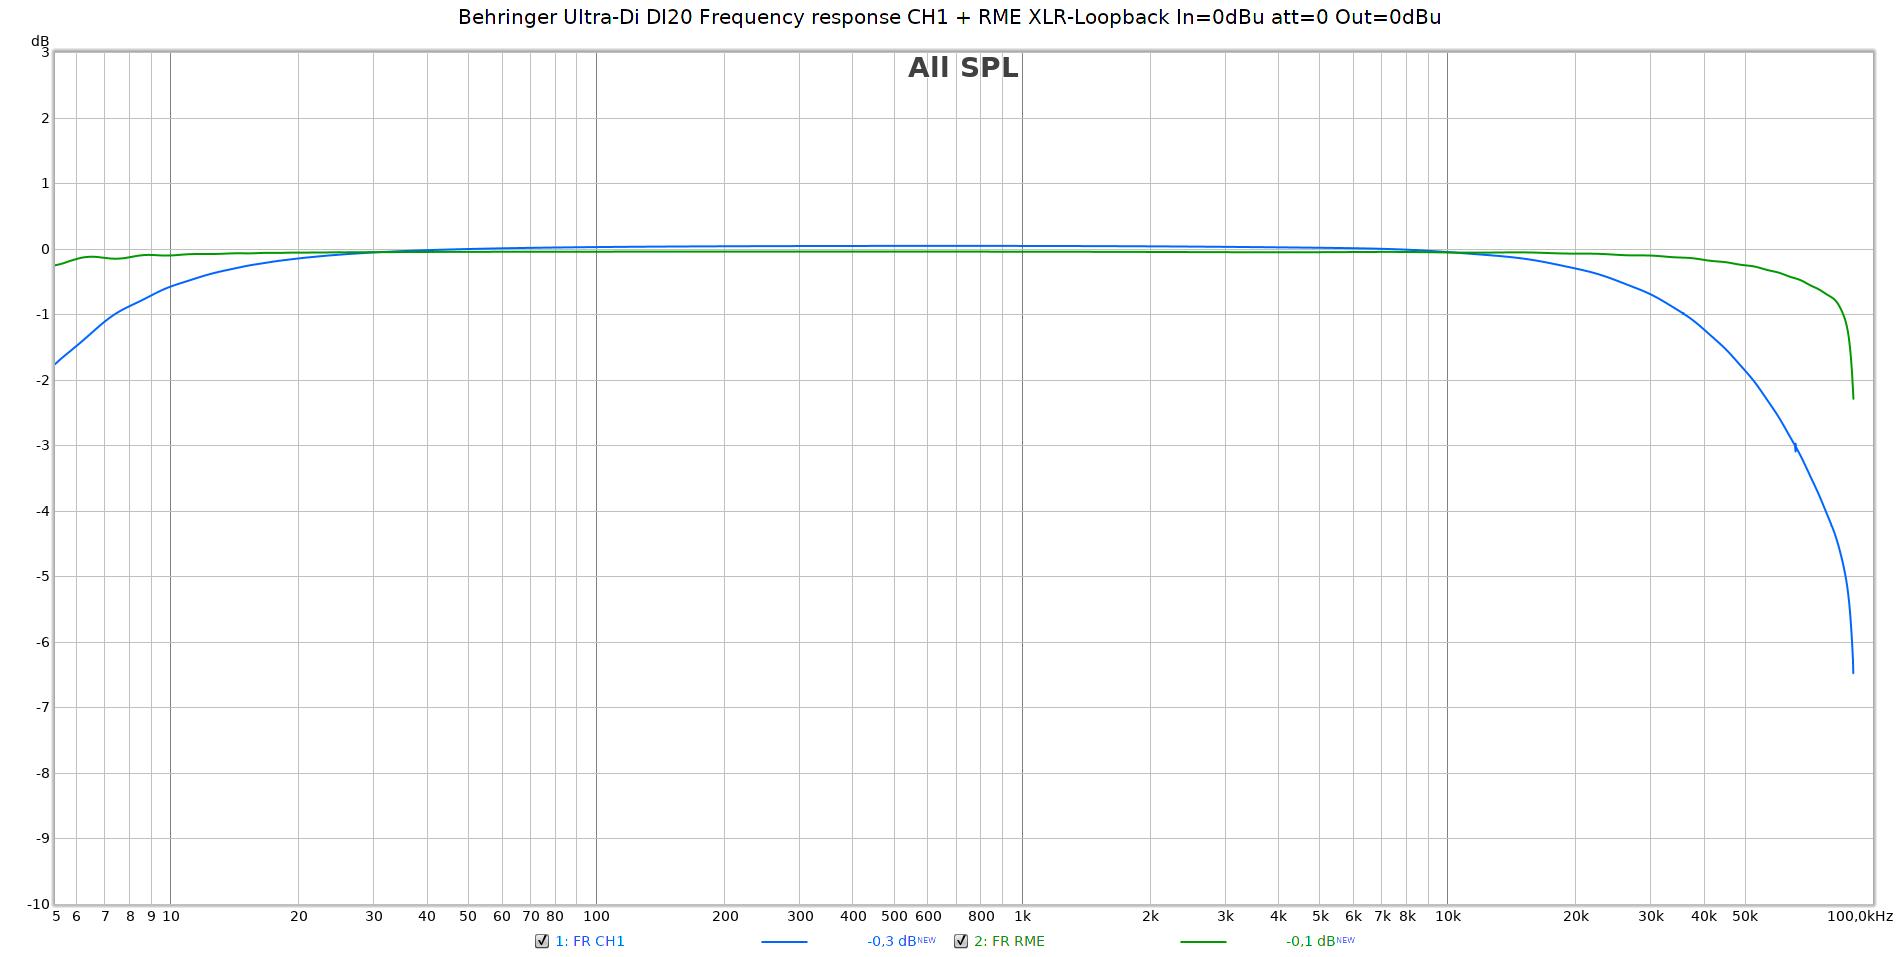 Behringer Ultra-Di DI20 Frequency response CH1 + RME XLR-Loopback In=0dBu att=0 Out=0dBu.png